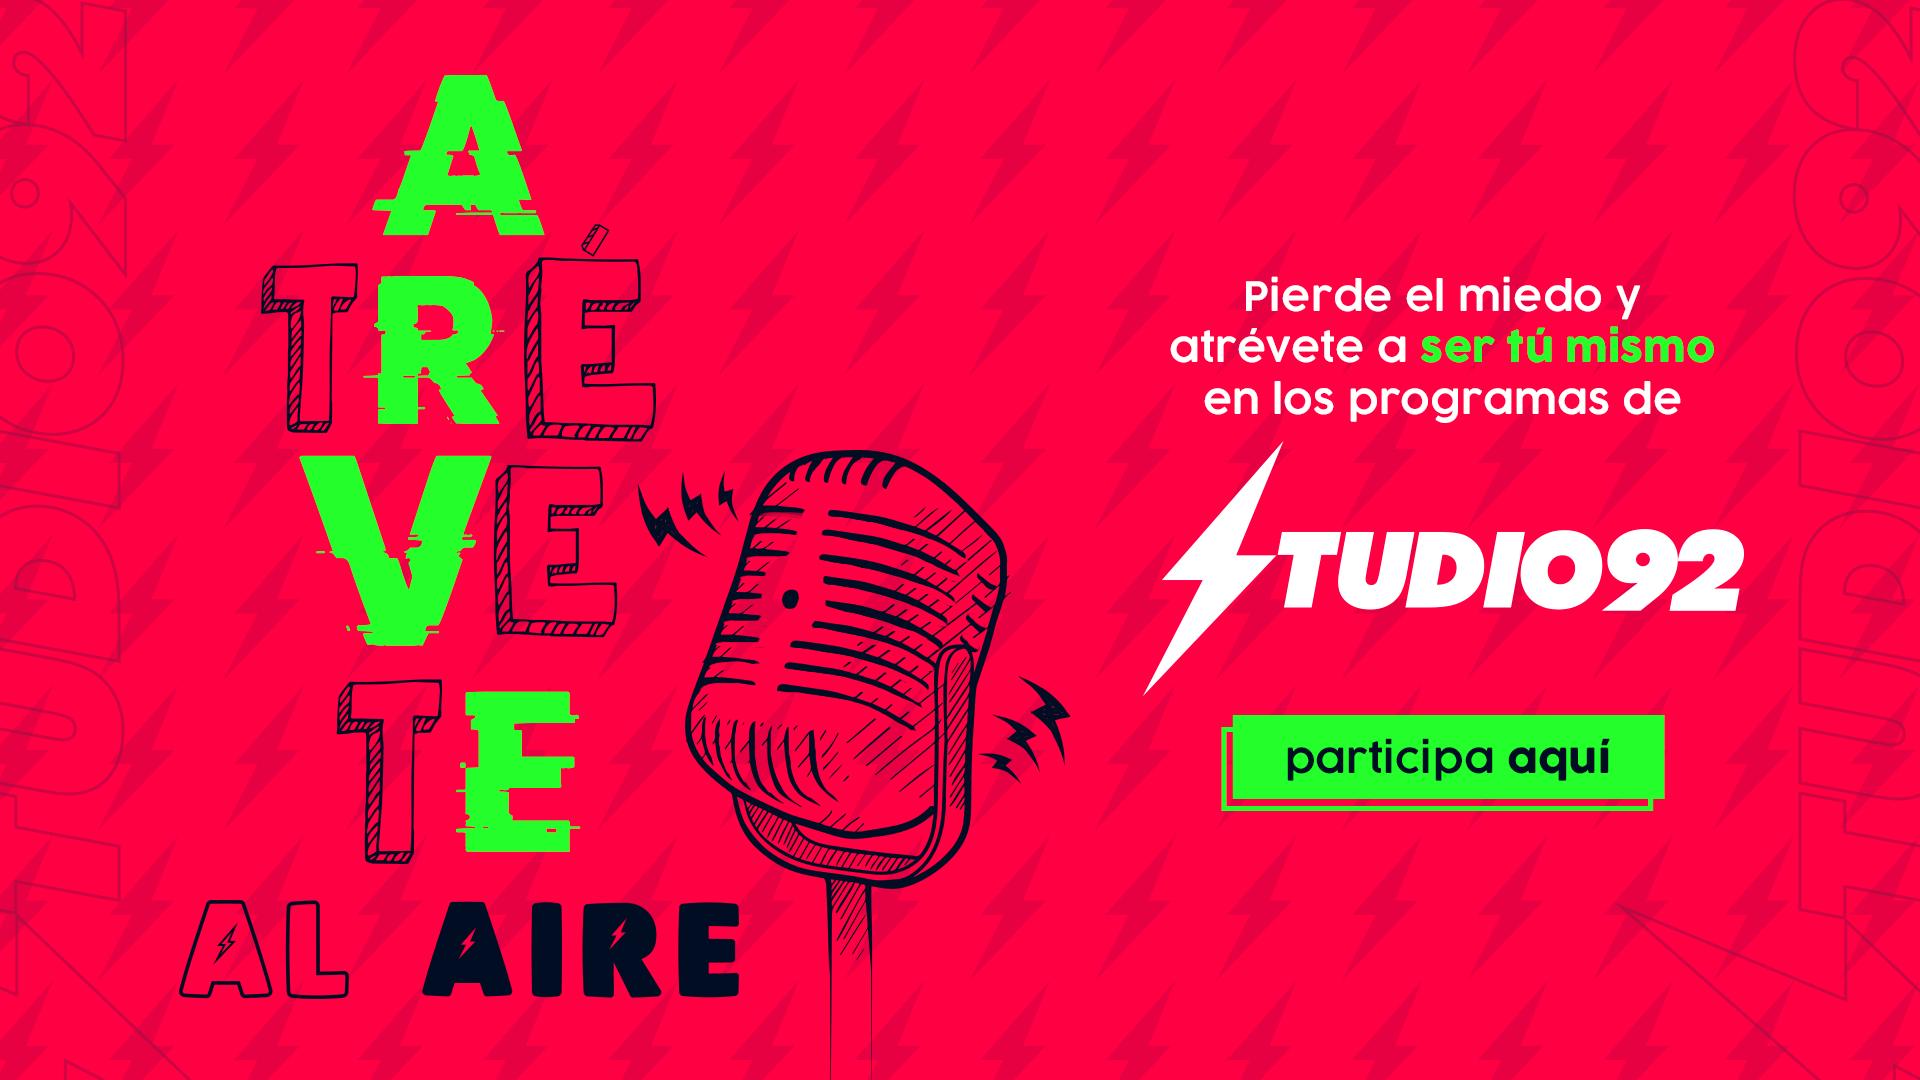 Atrévete Al Aire (Verano 2020)